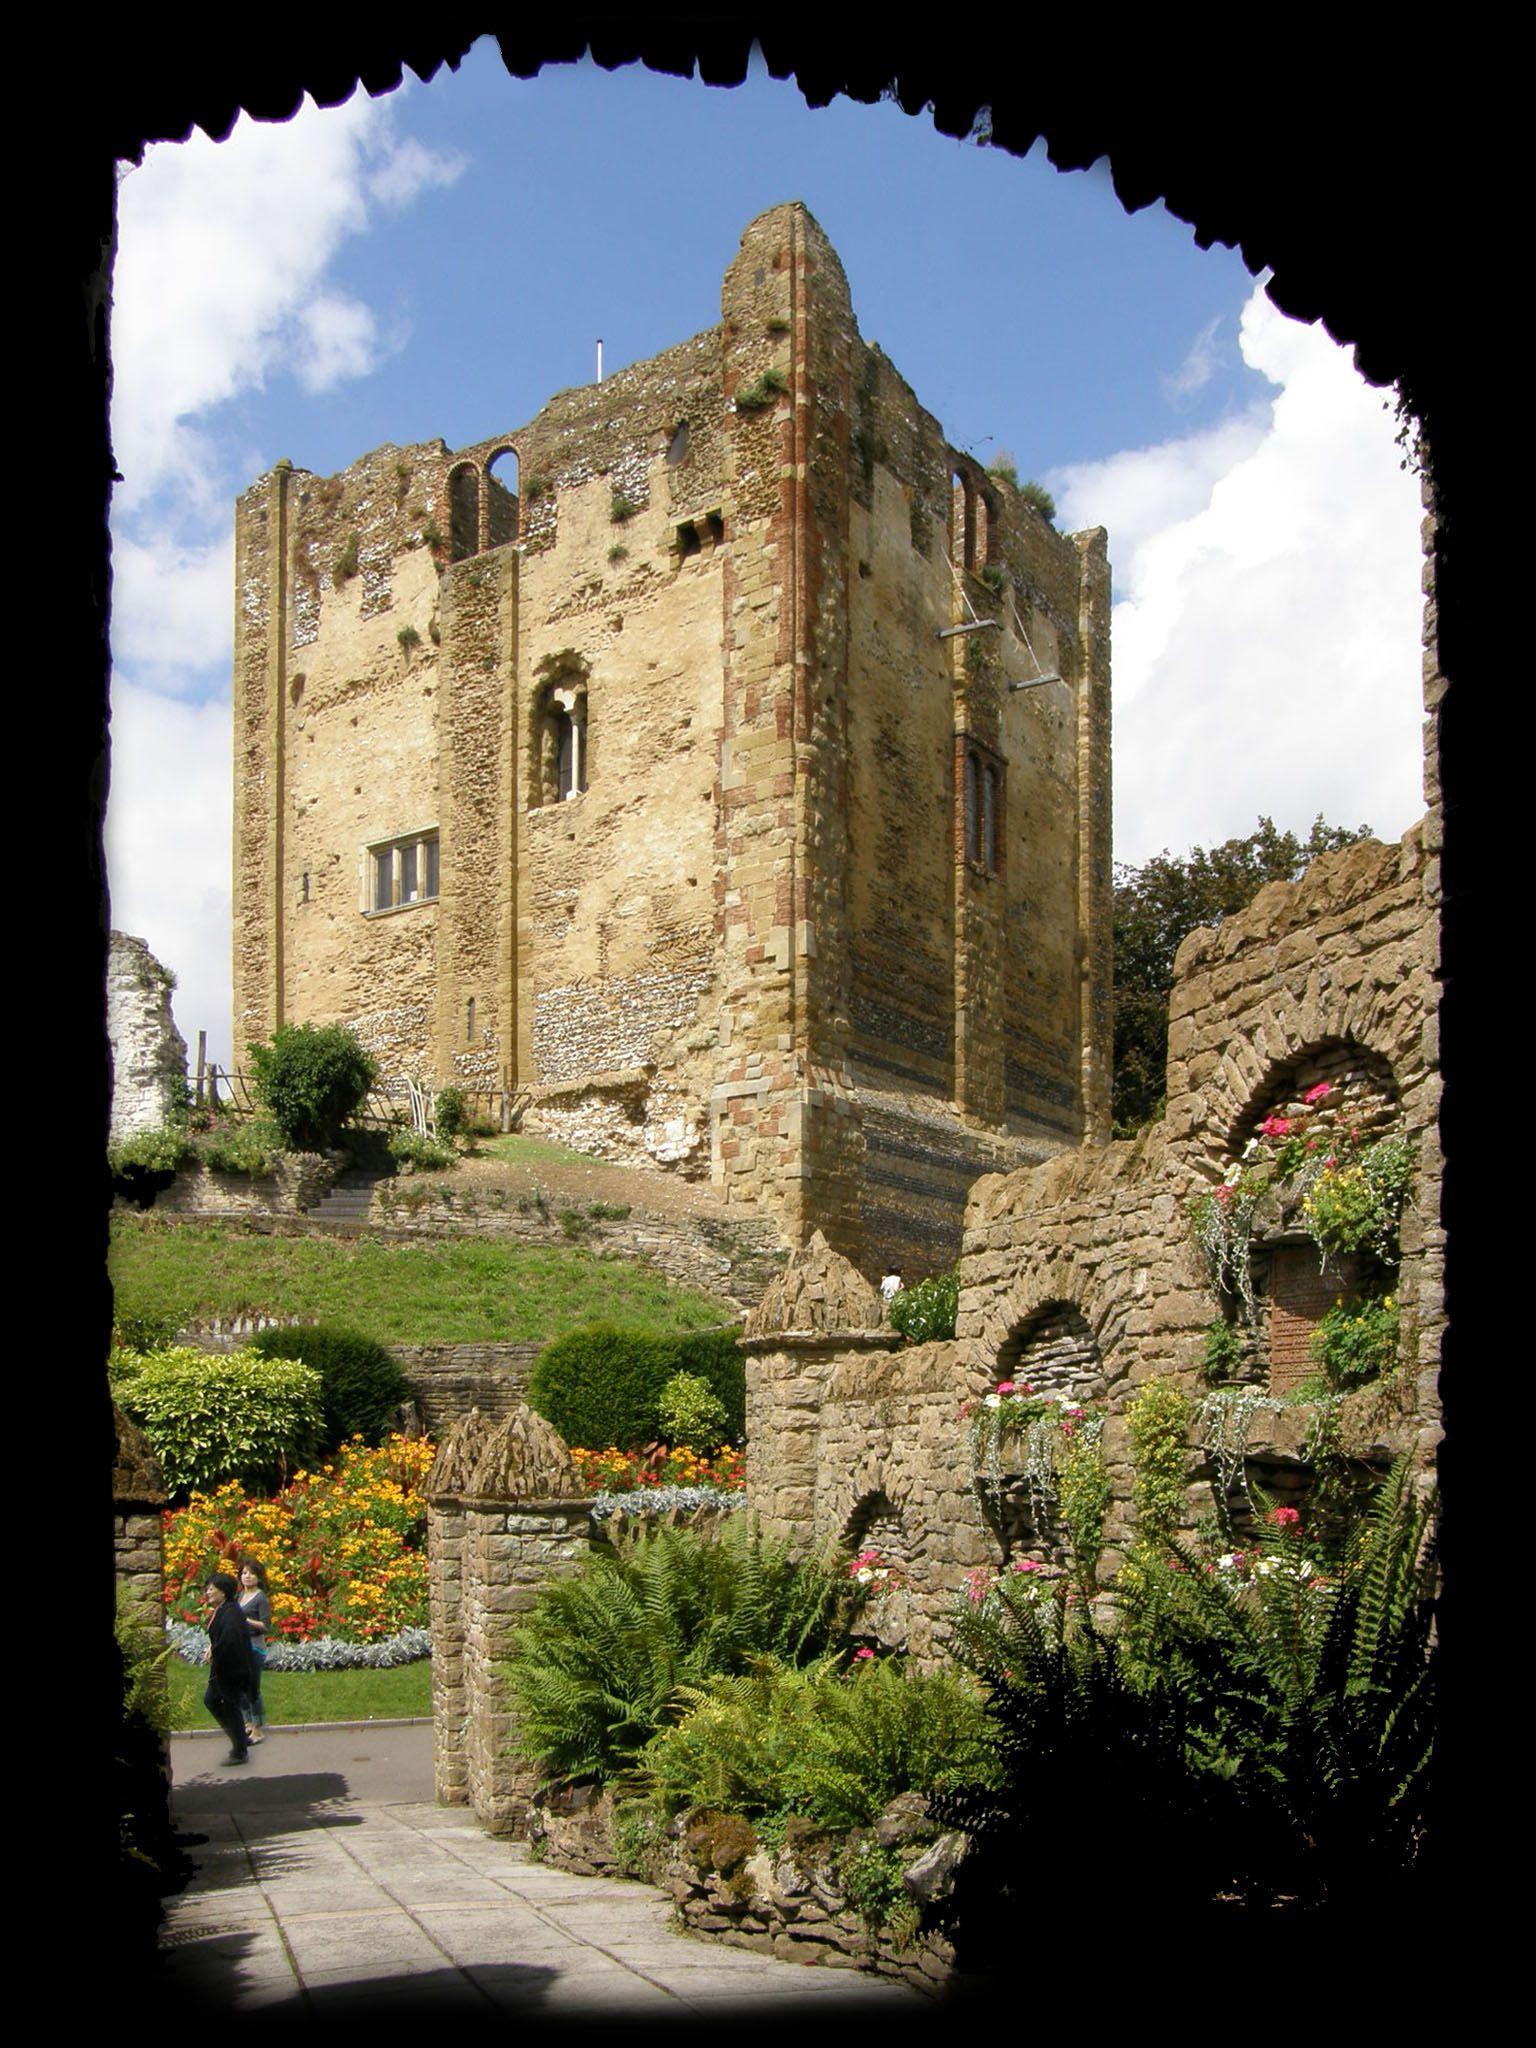 Guildford Castle and Museum Castle Arch ~ Guildford, Surrey, England